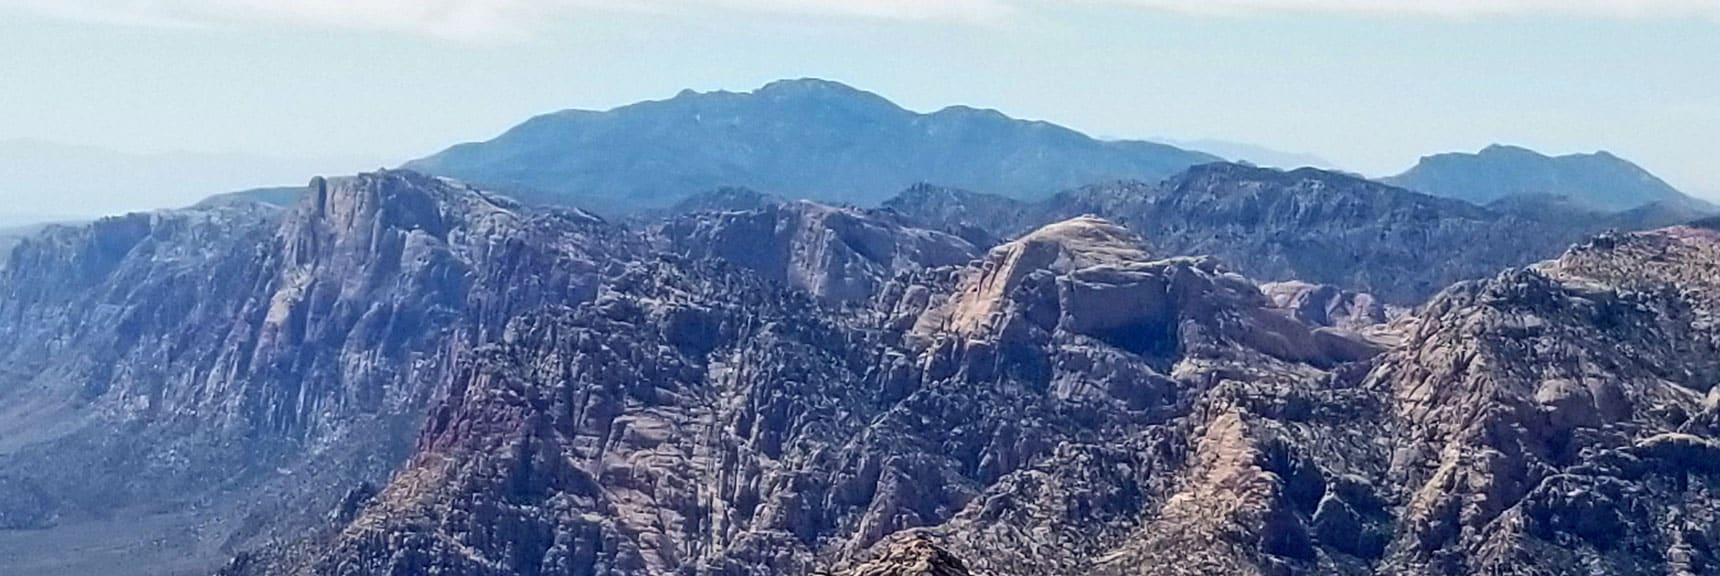 BKeystone Thrust Summit, Red Rock National Park, Nevada